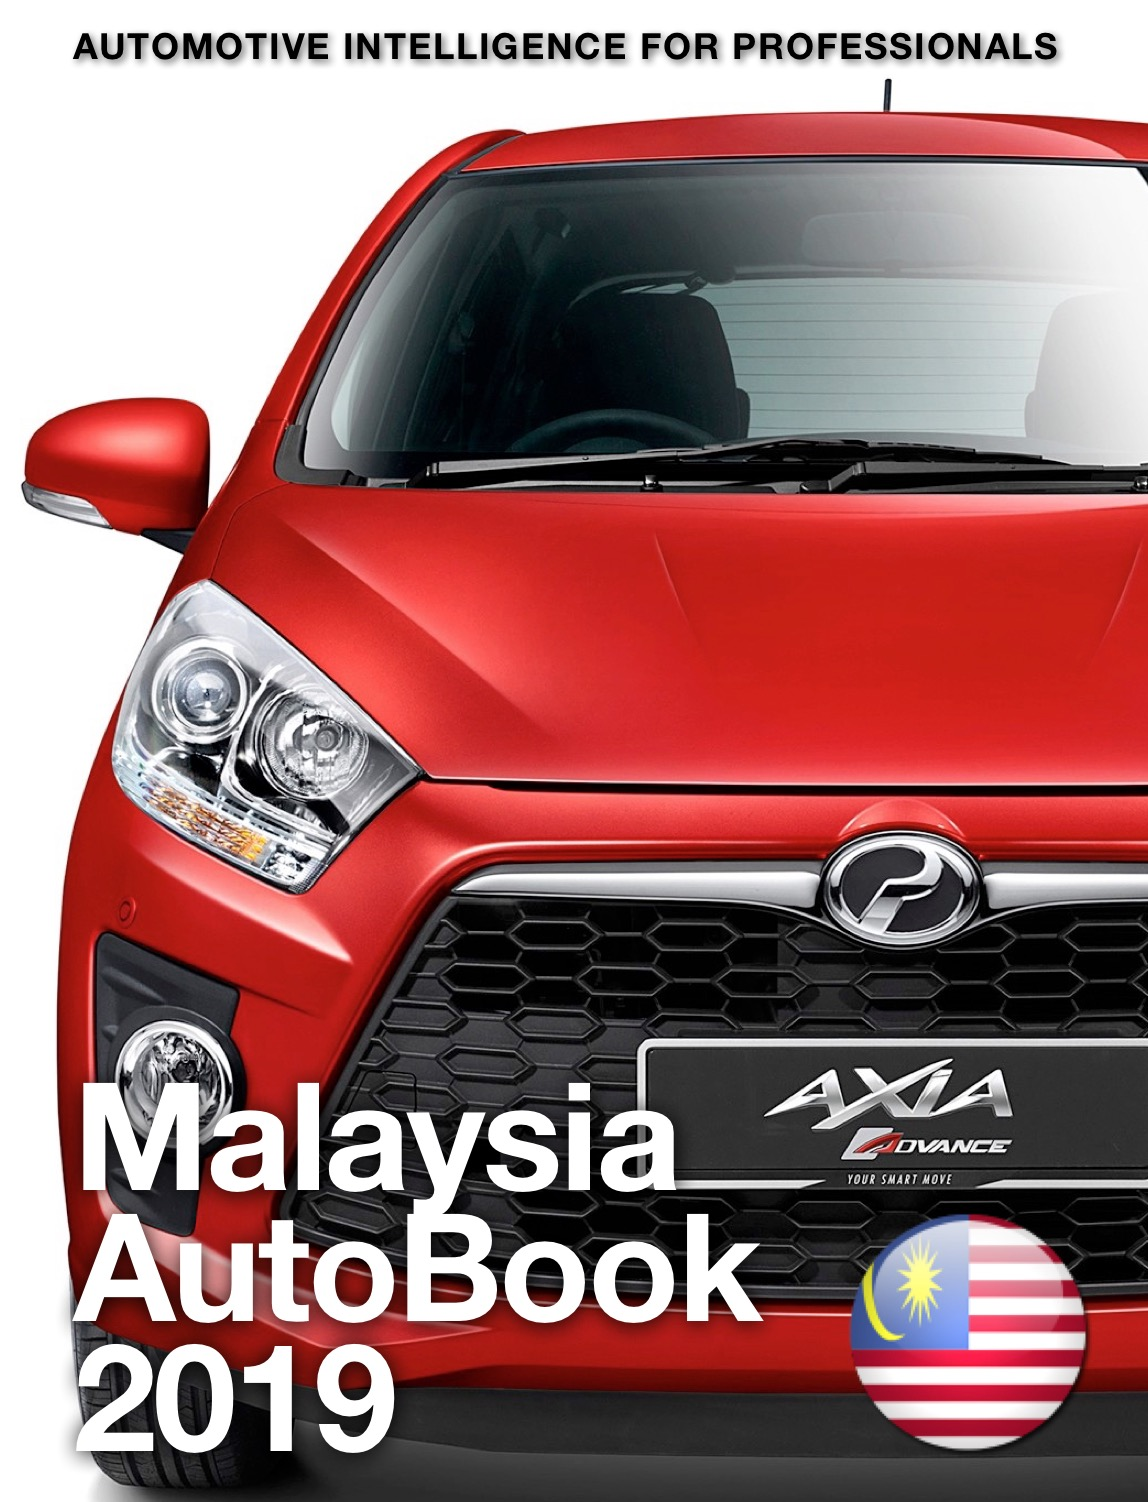 Malaysia AutoBook 2019 Cover.jpg